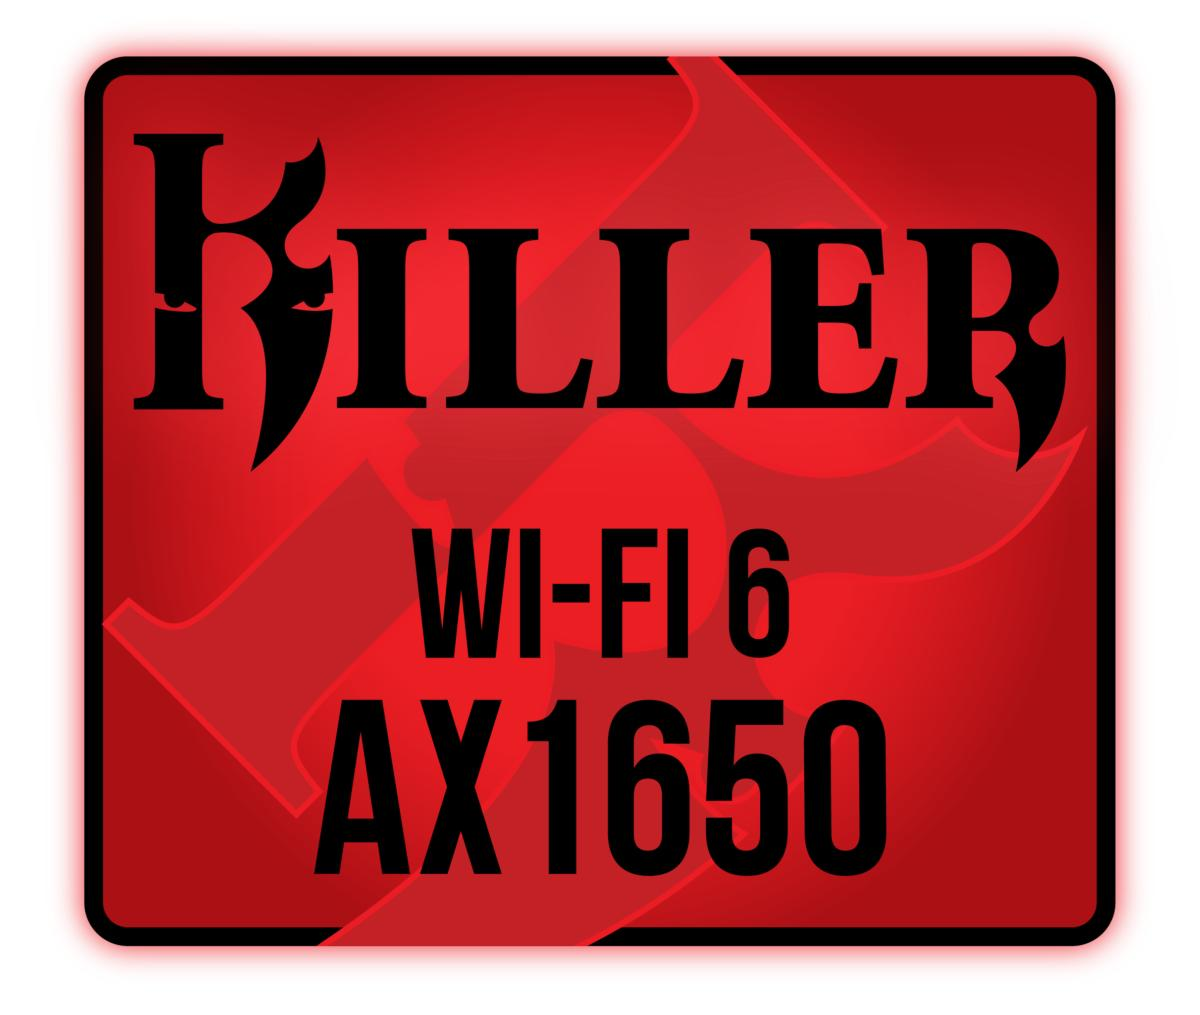 killer wfi6 ax1650